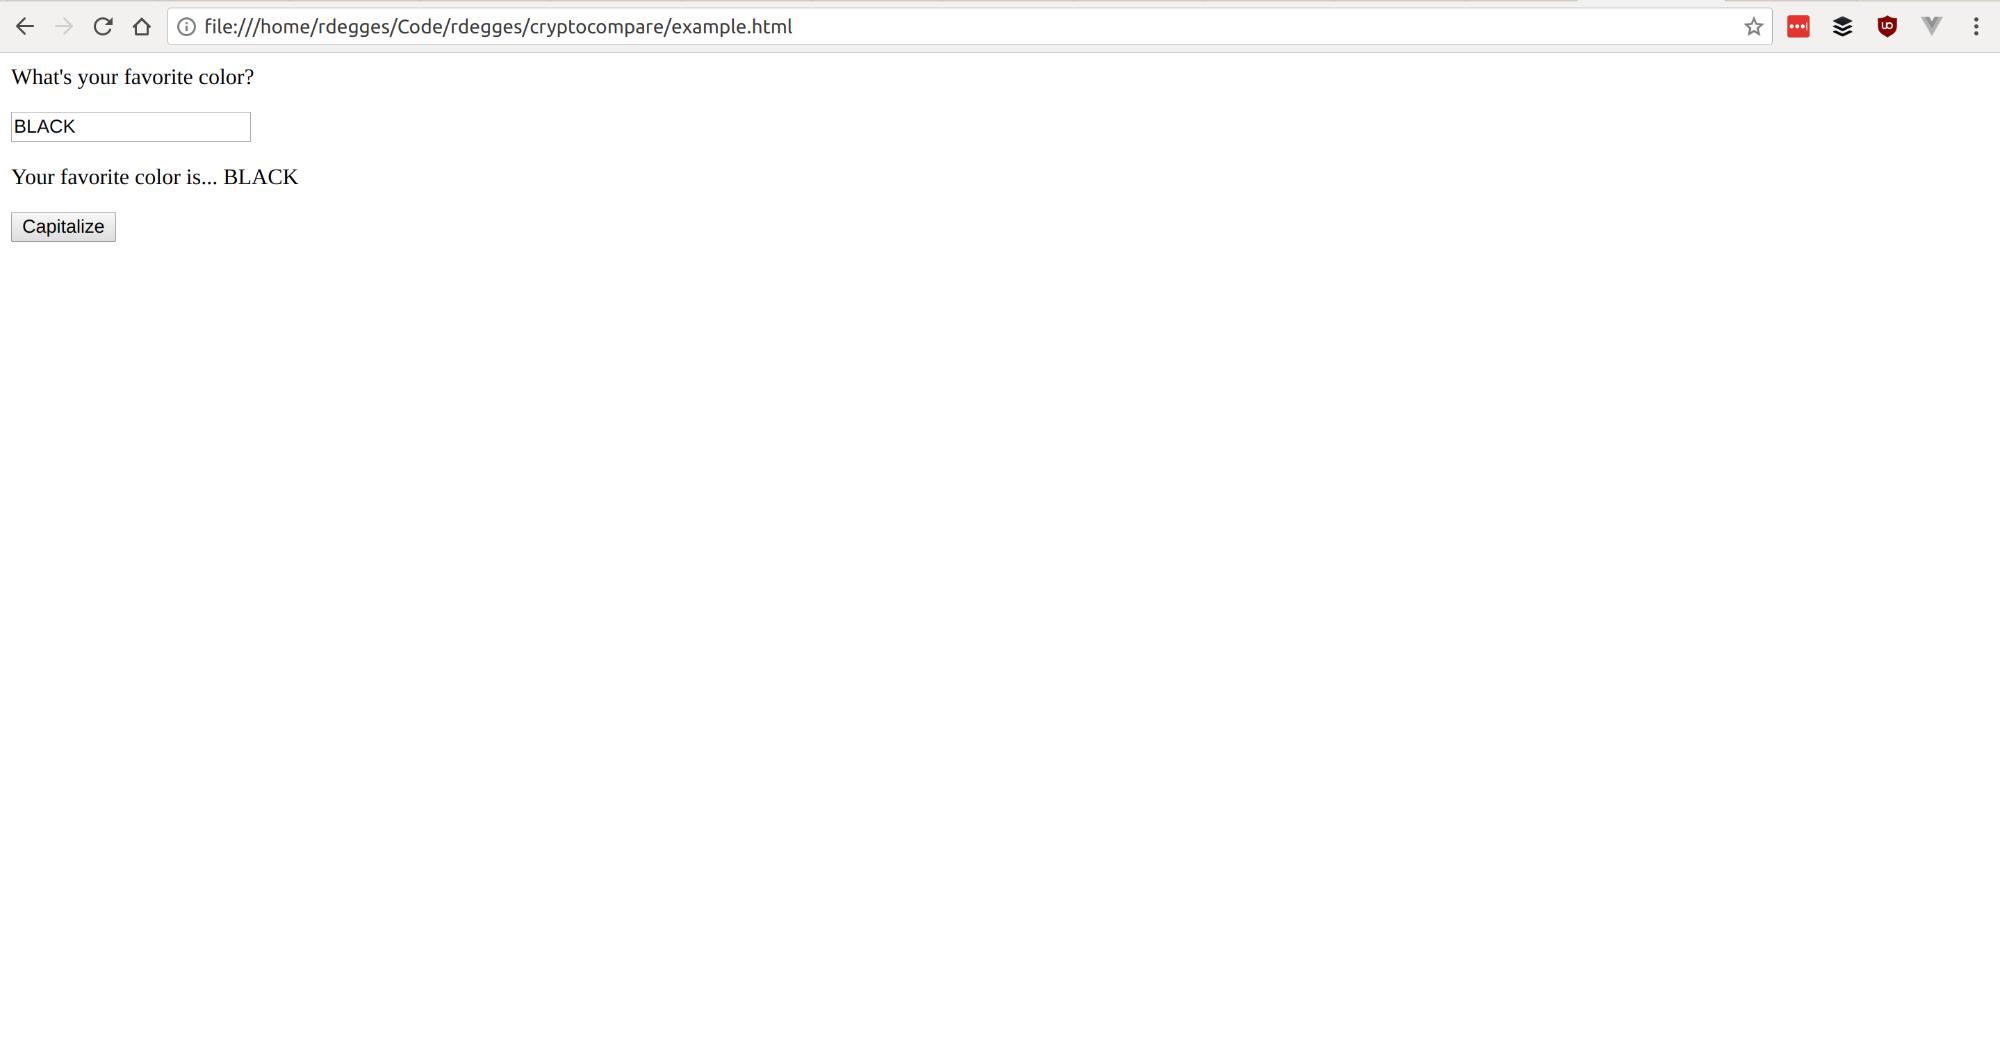 Capitalize Screenshot